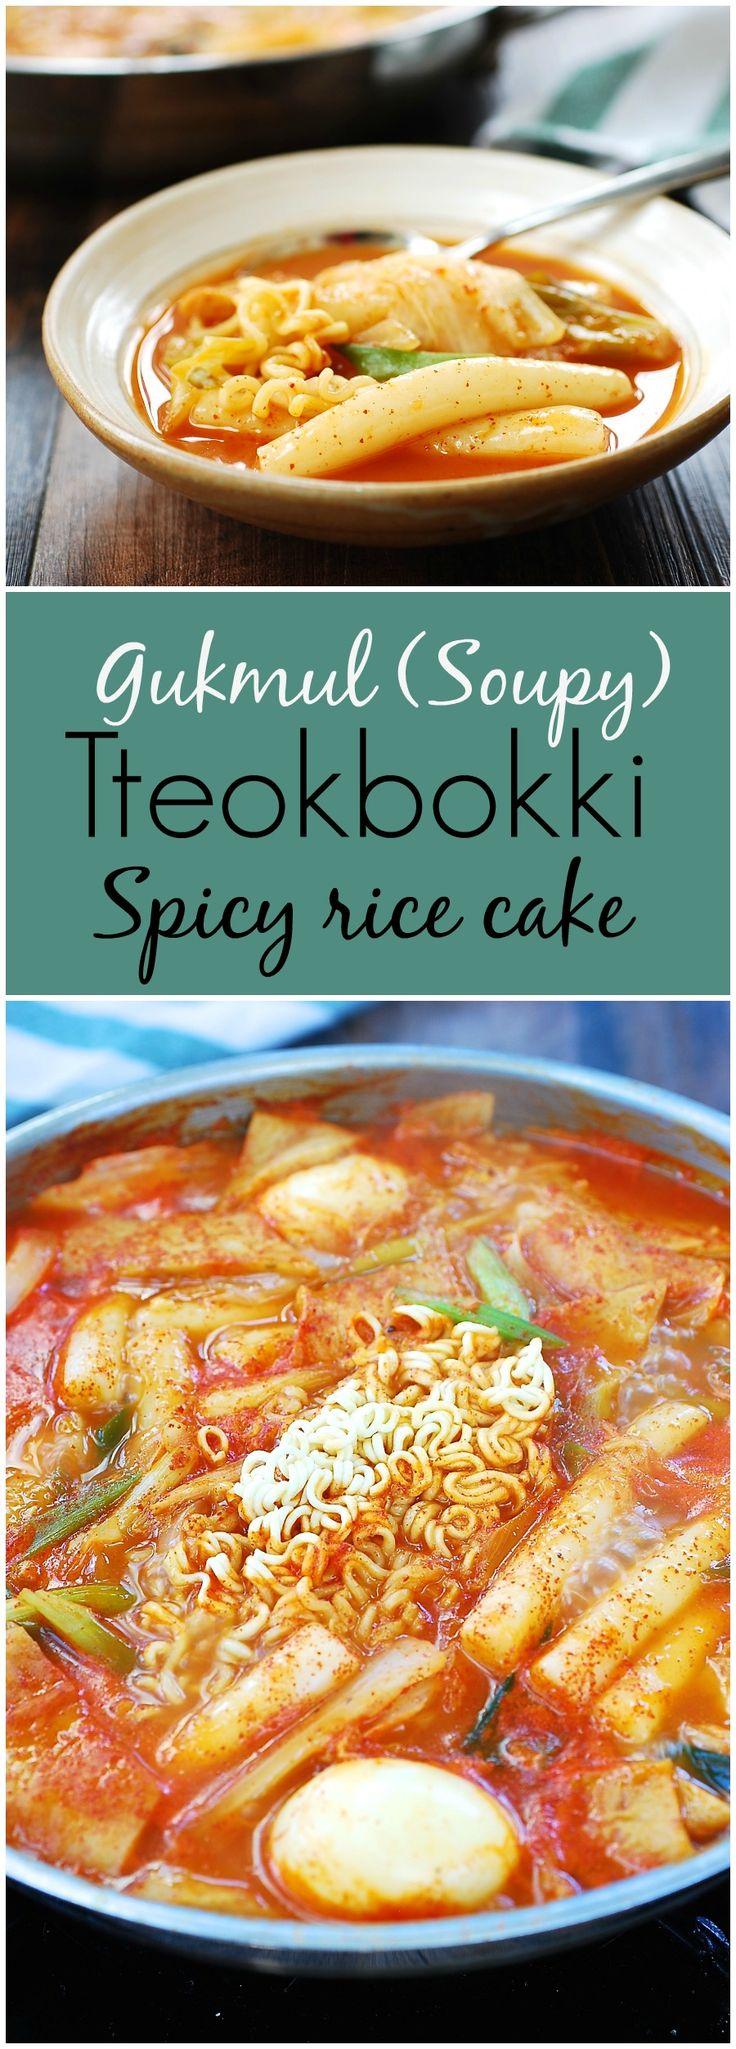 Soupy Tteokbokki  Spicy Braised Korean Rice Cakes In Flavorful Broth!